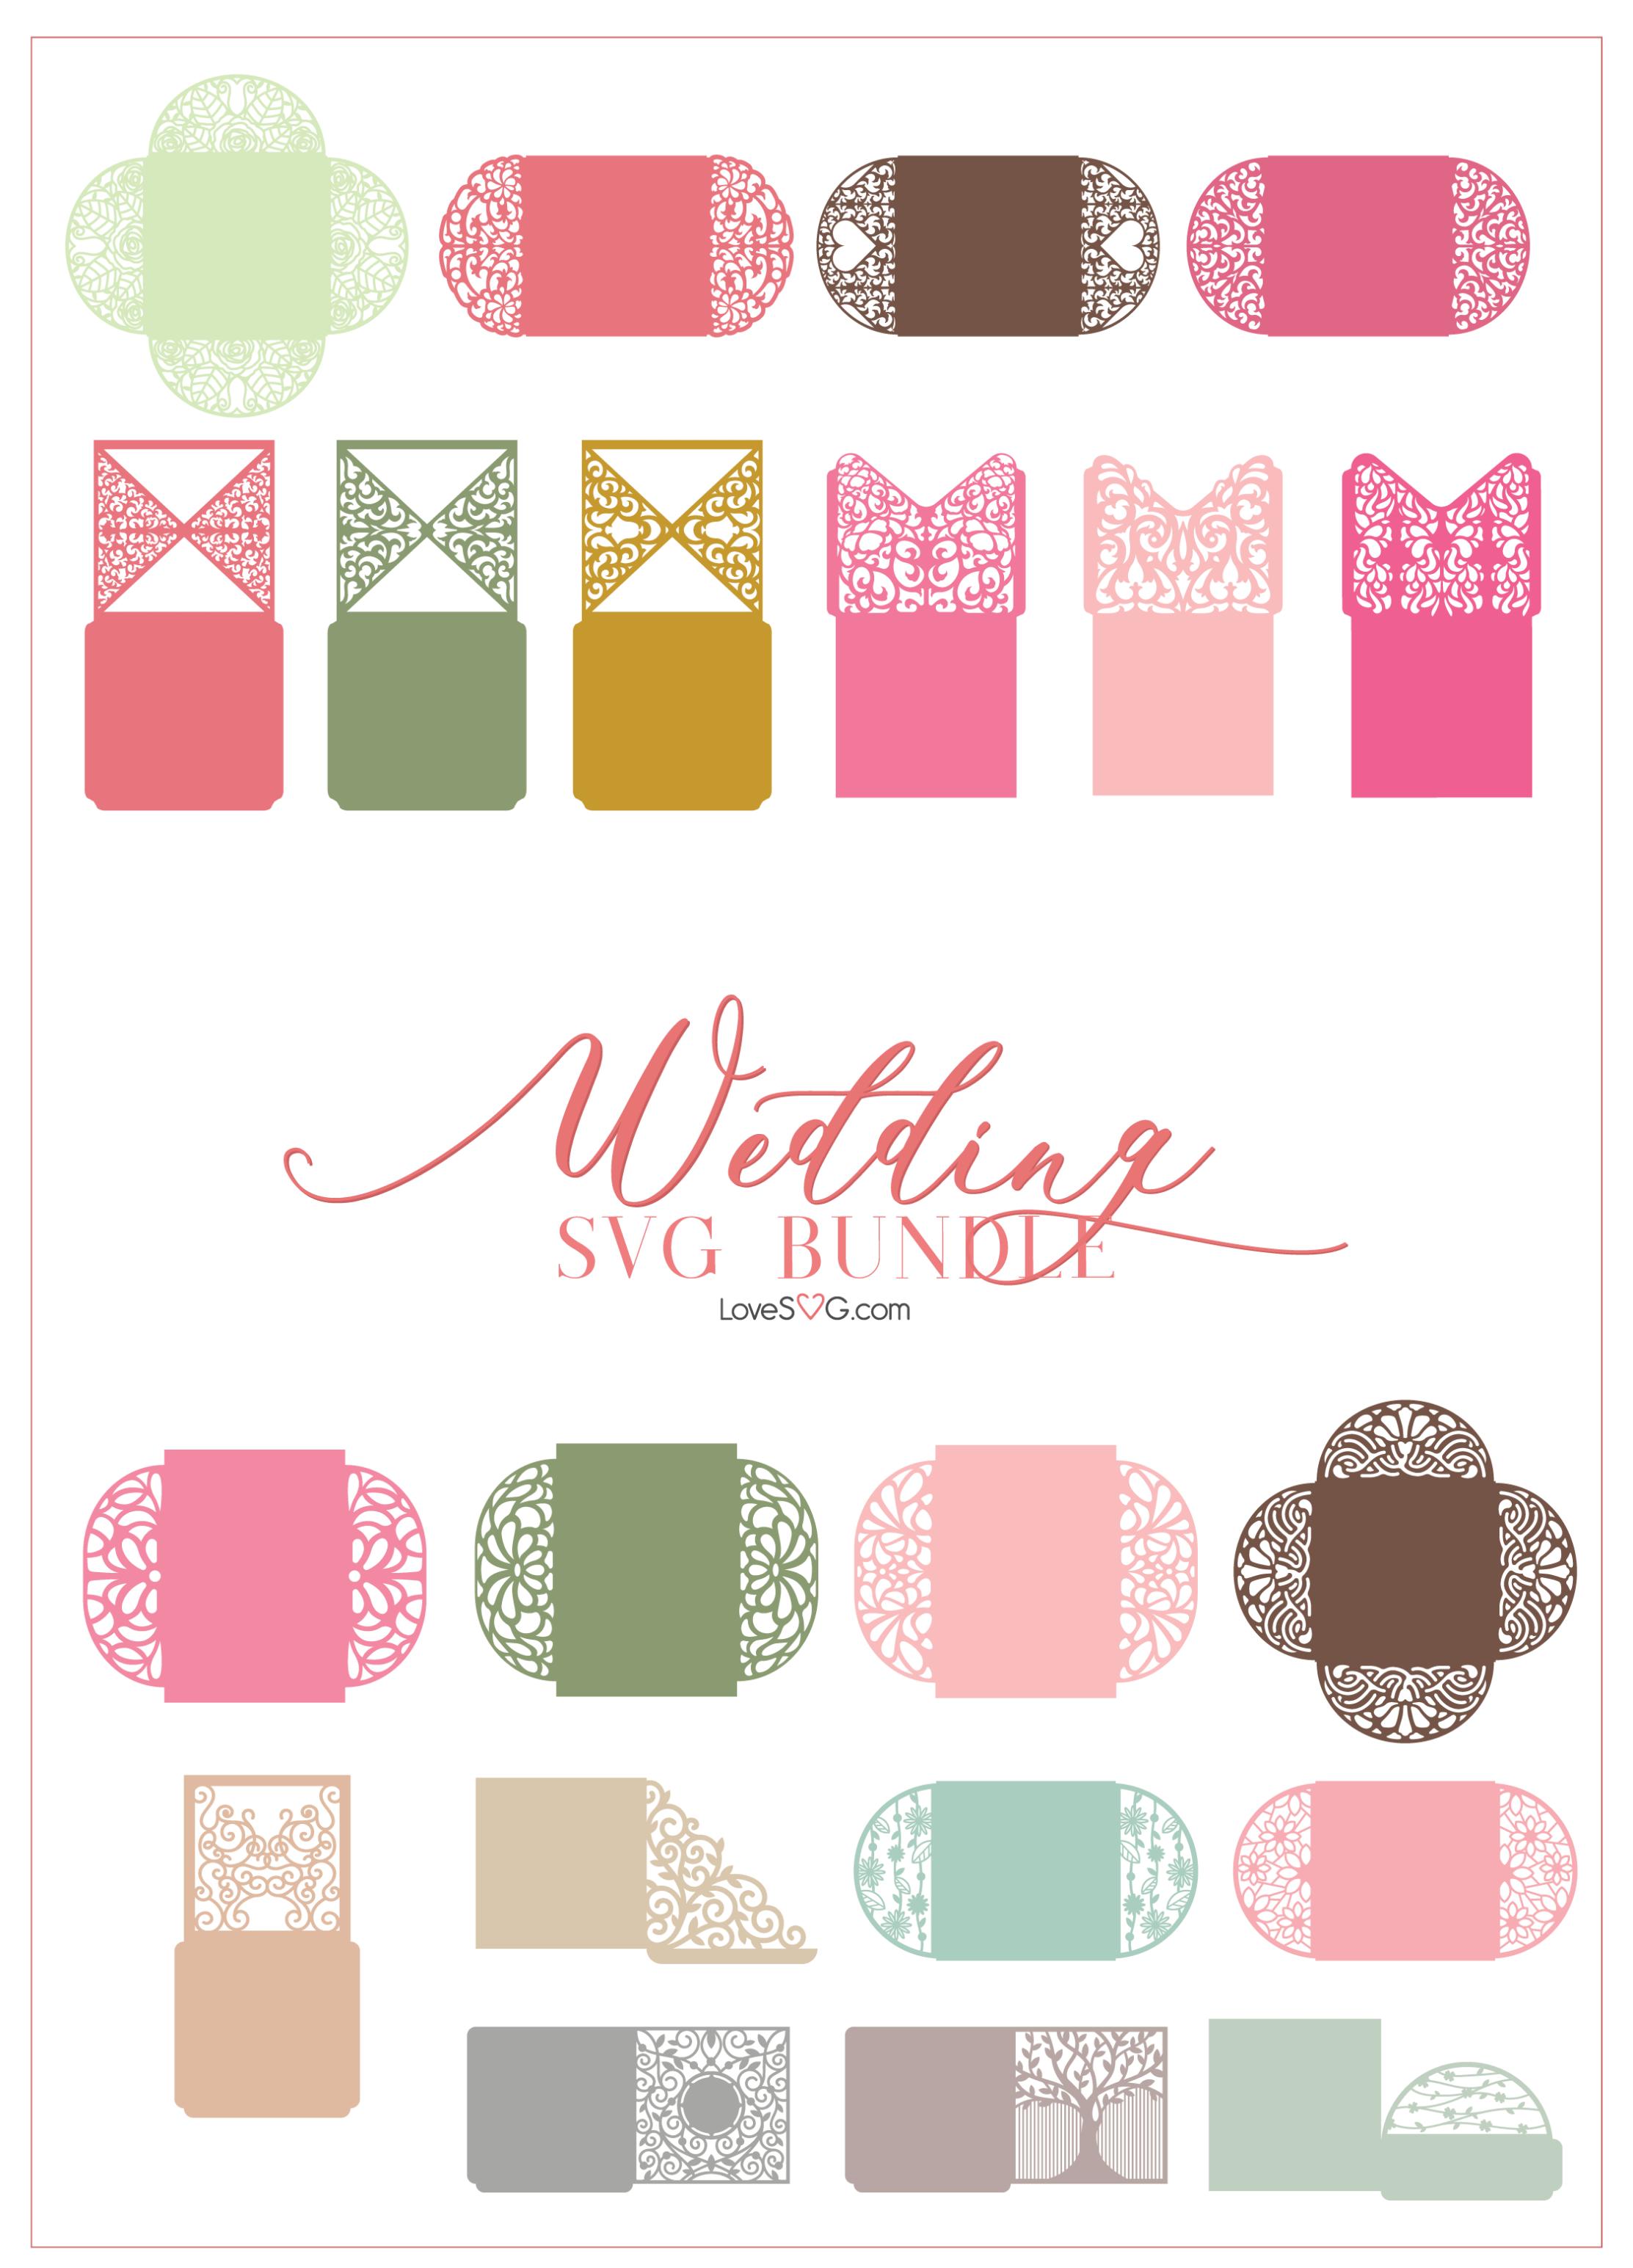 The Wedding SVG Bundle LoveSVG Preview (5) Cricut